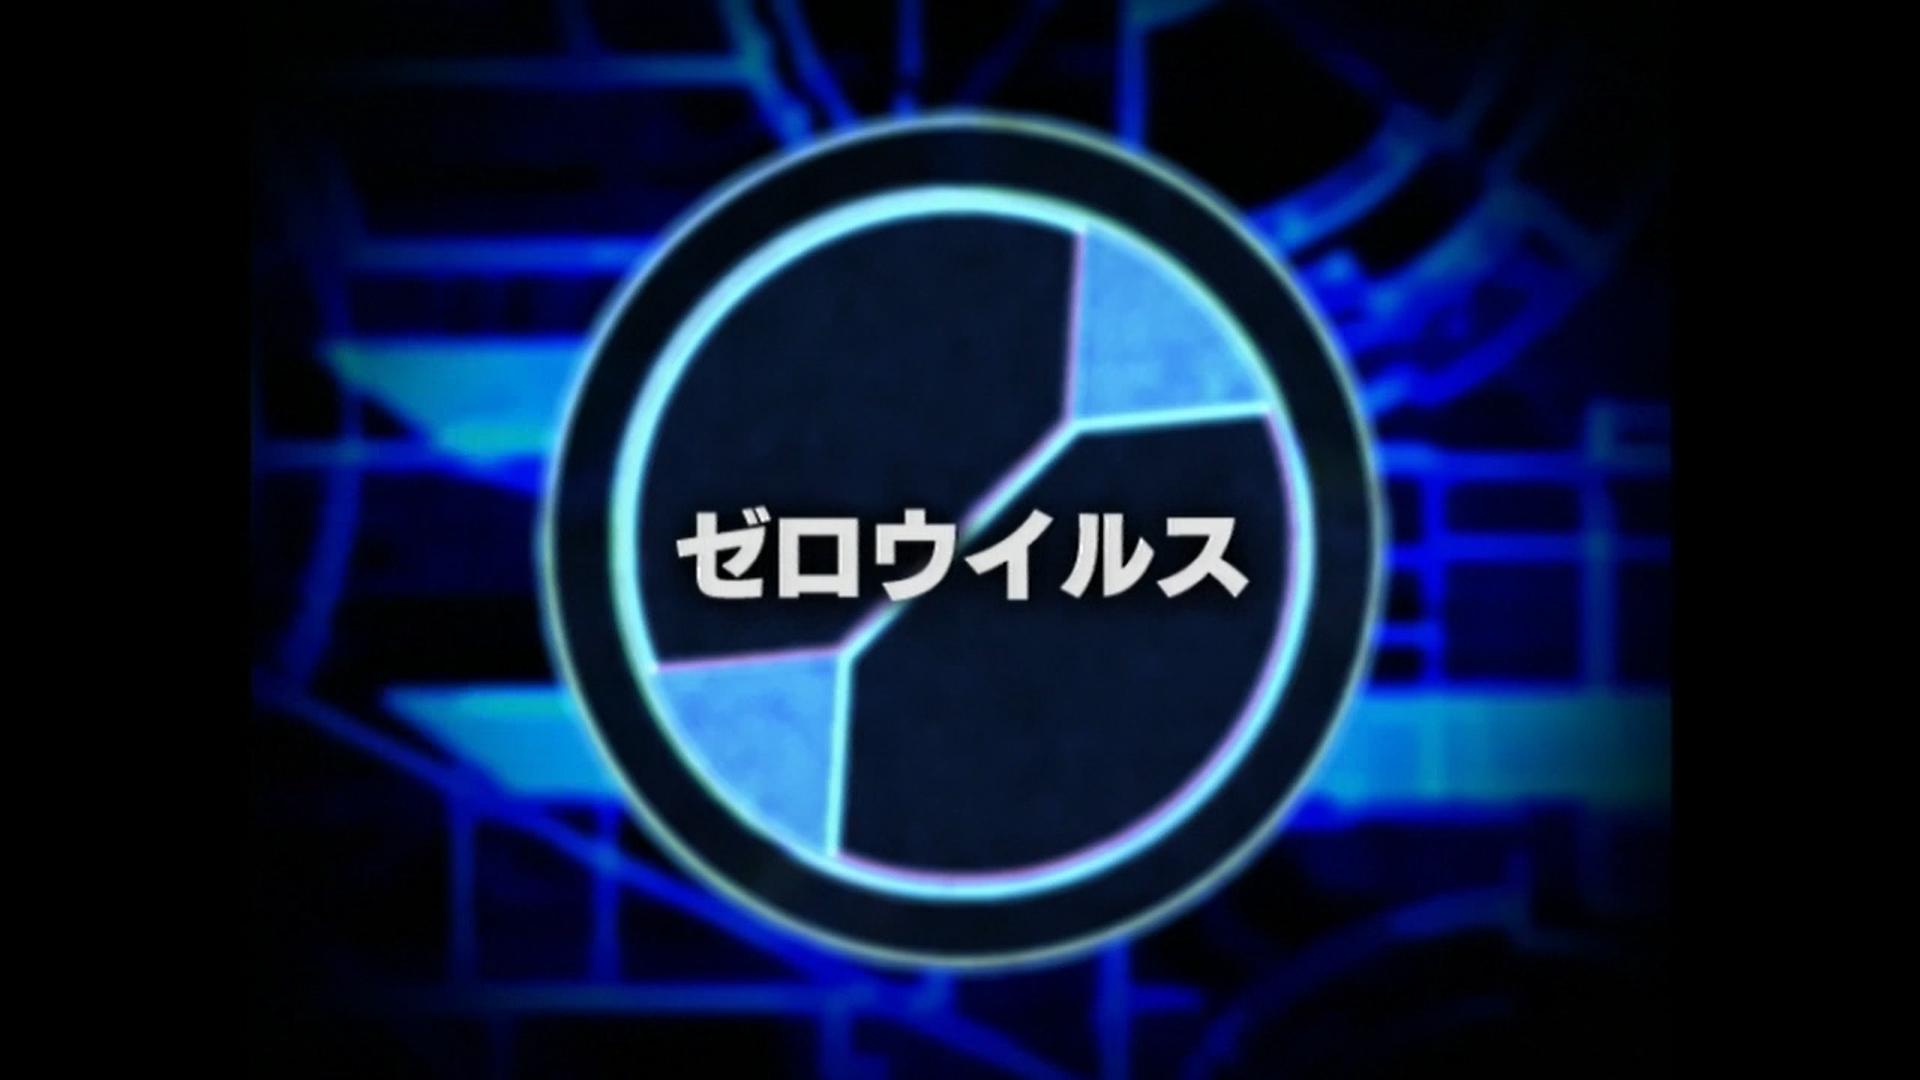 Zero Virus (episode)